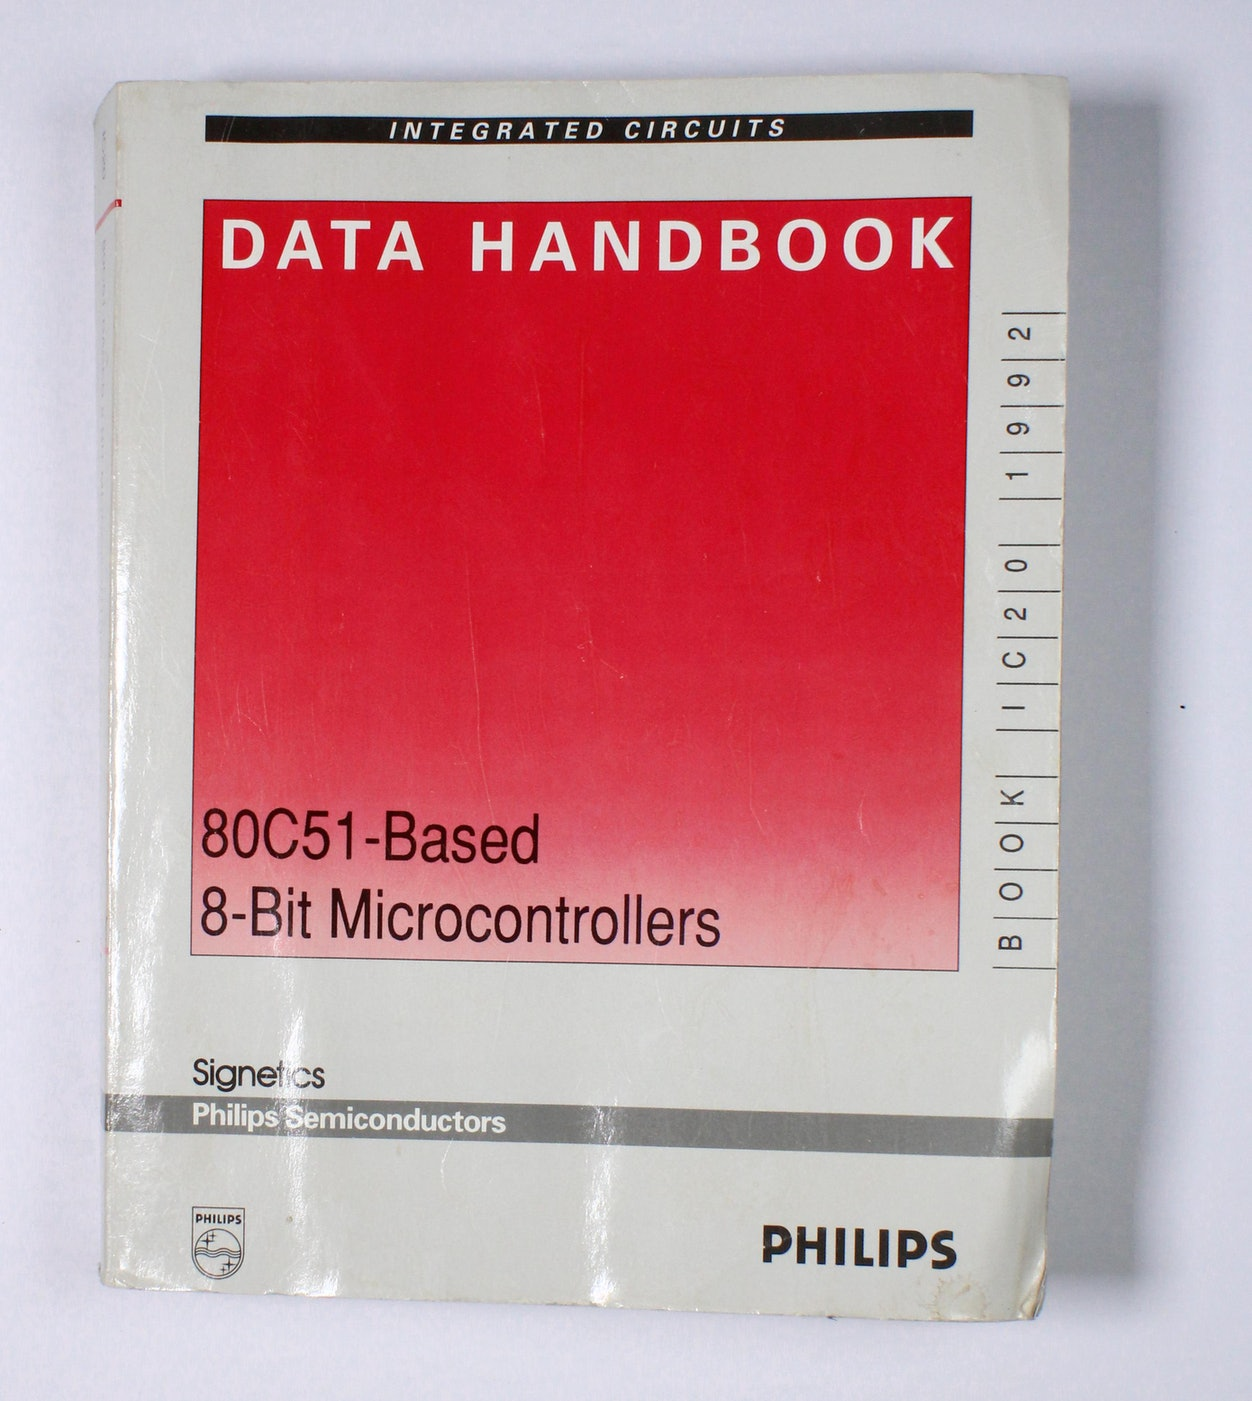 Data Handbook 80C51-Based 8-Bit Microcontrollers